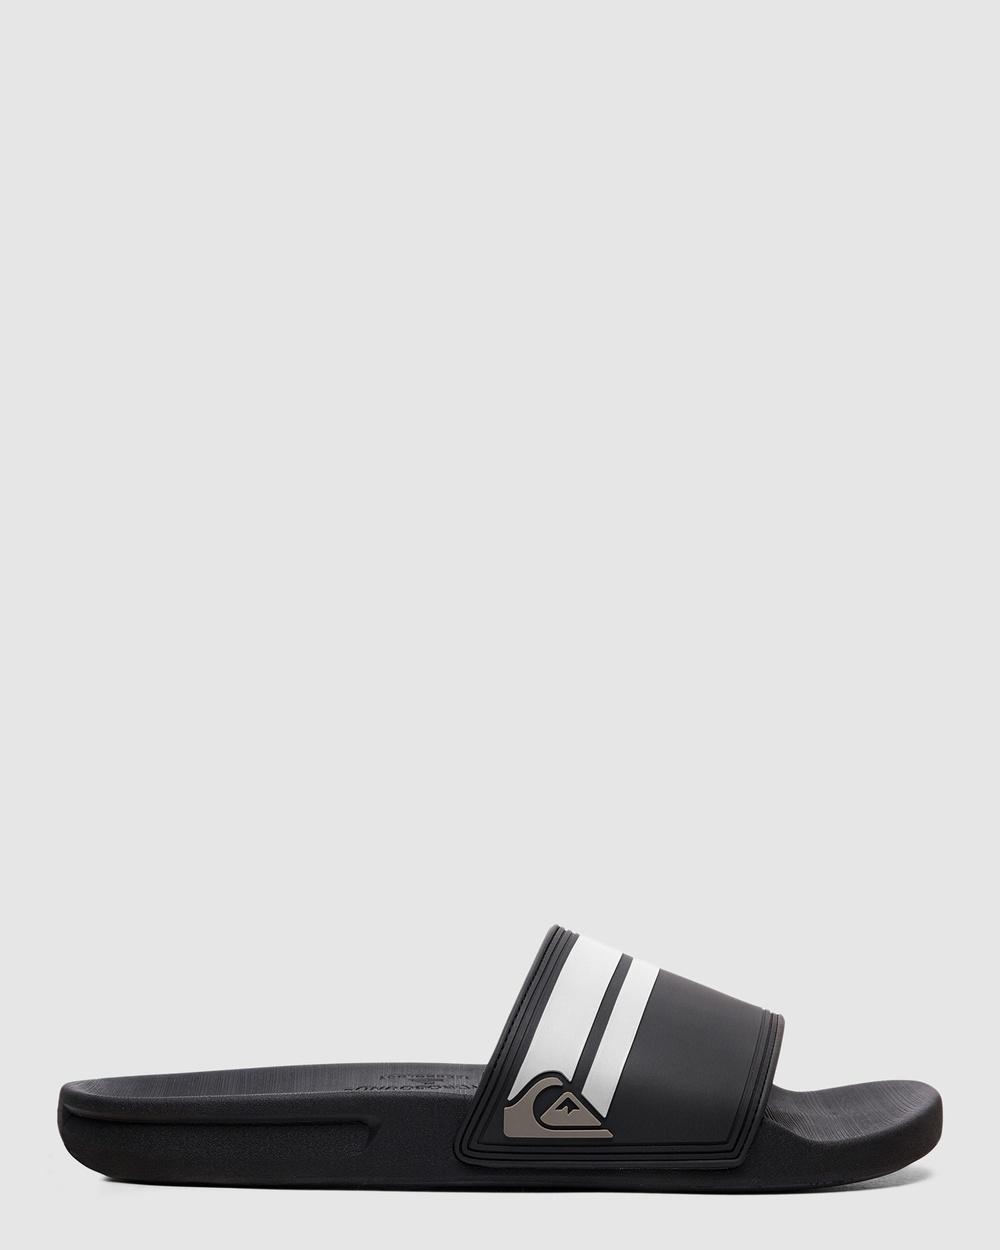 Quiksilver Mens Rivi Slide Slider Sandals Slides Black/Black/White